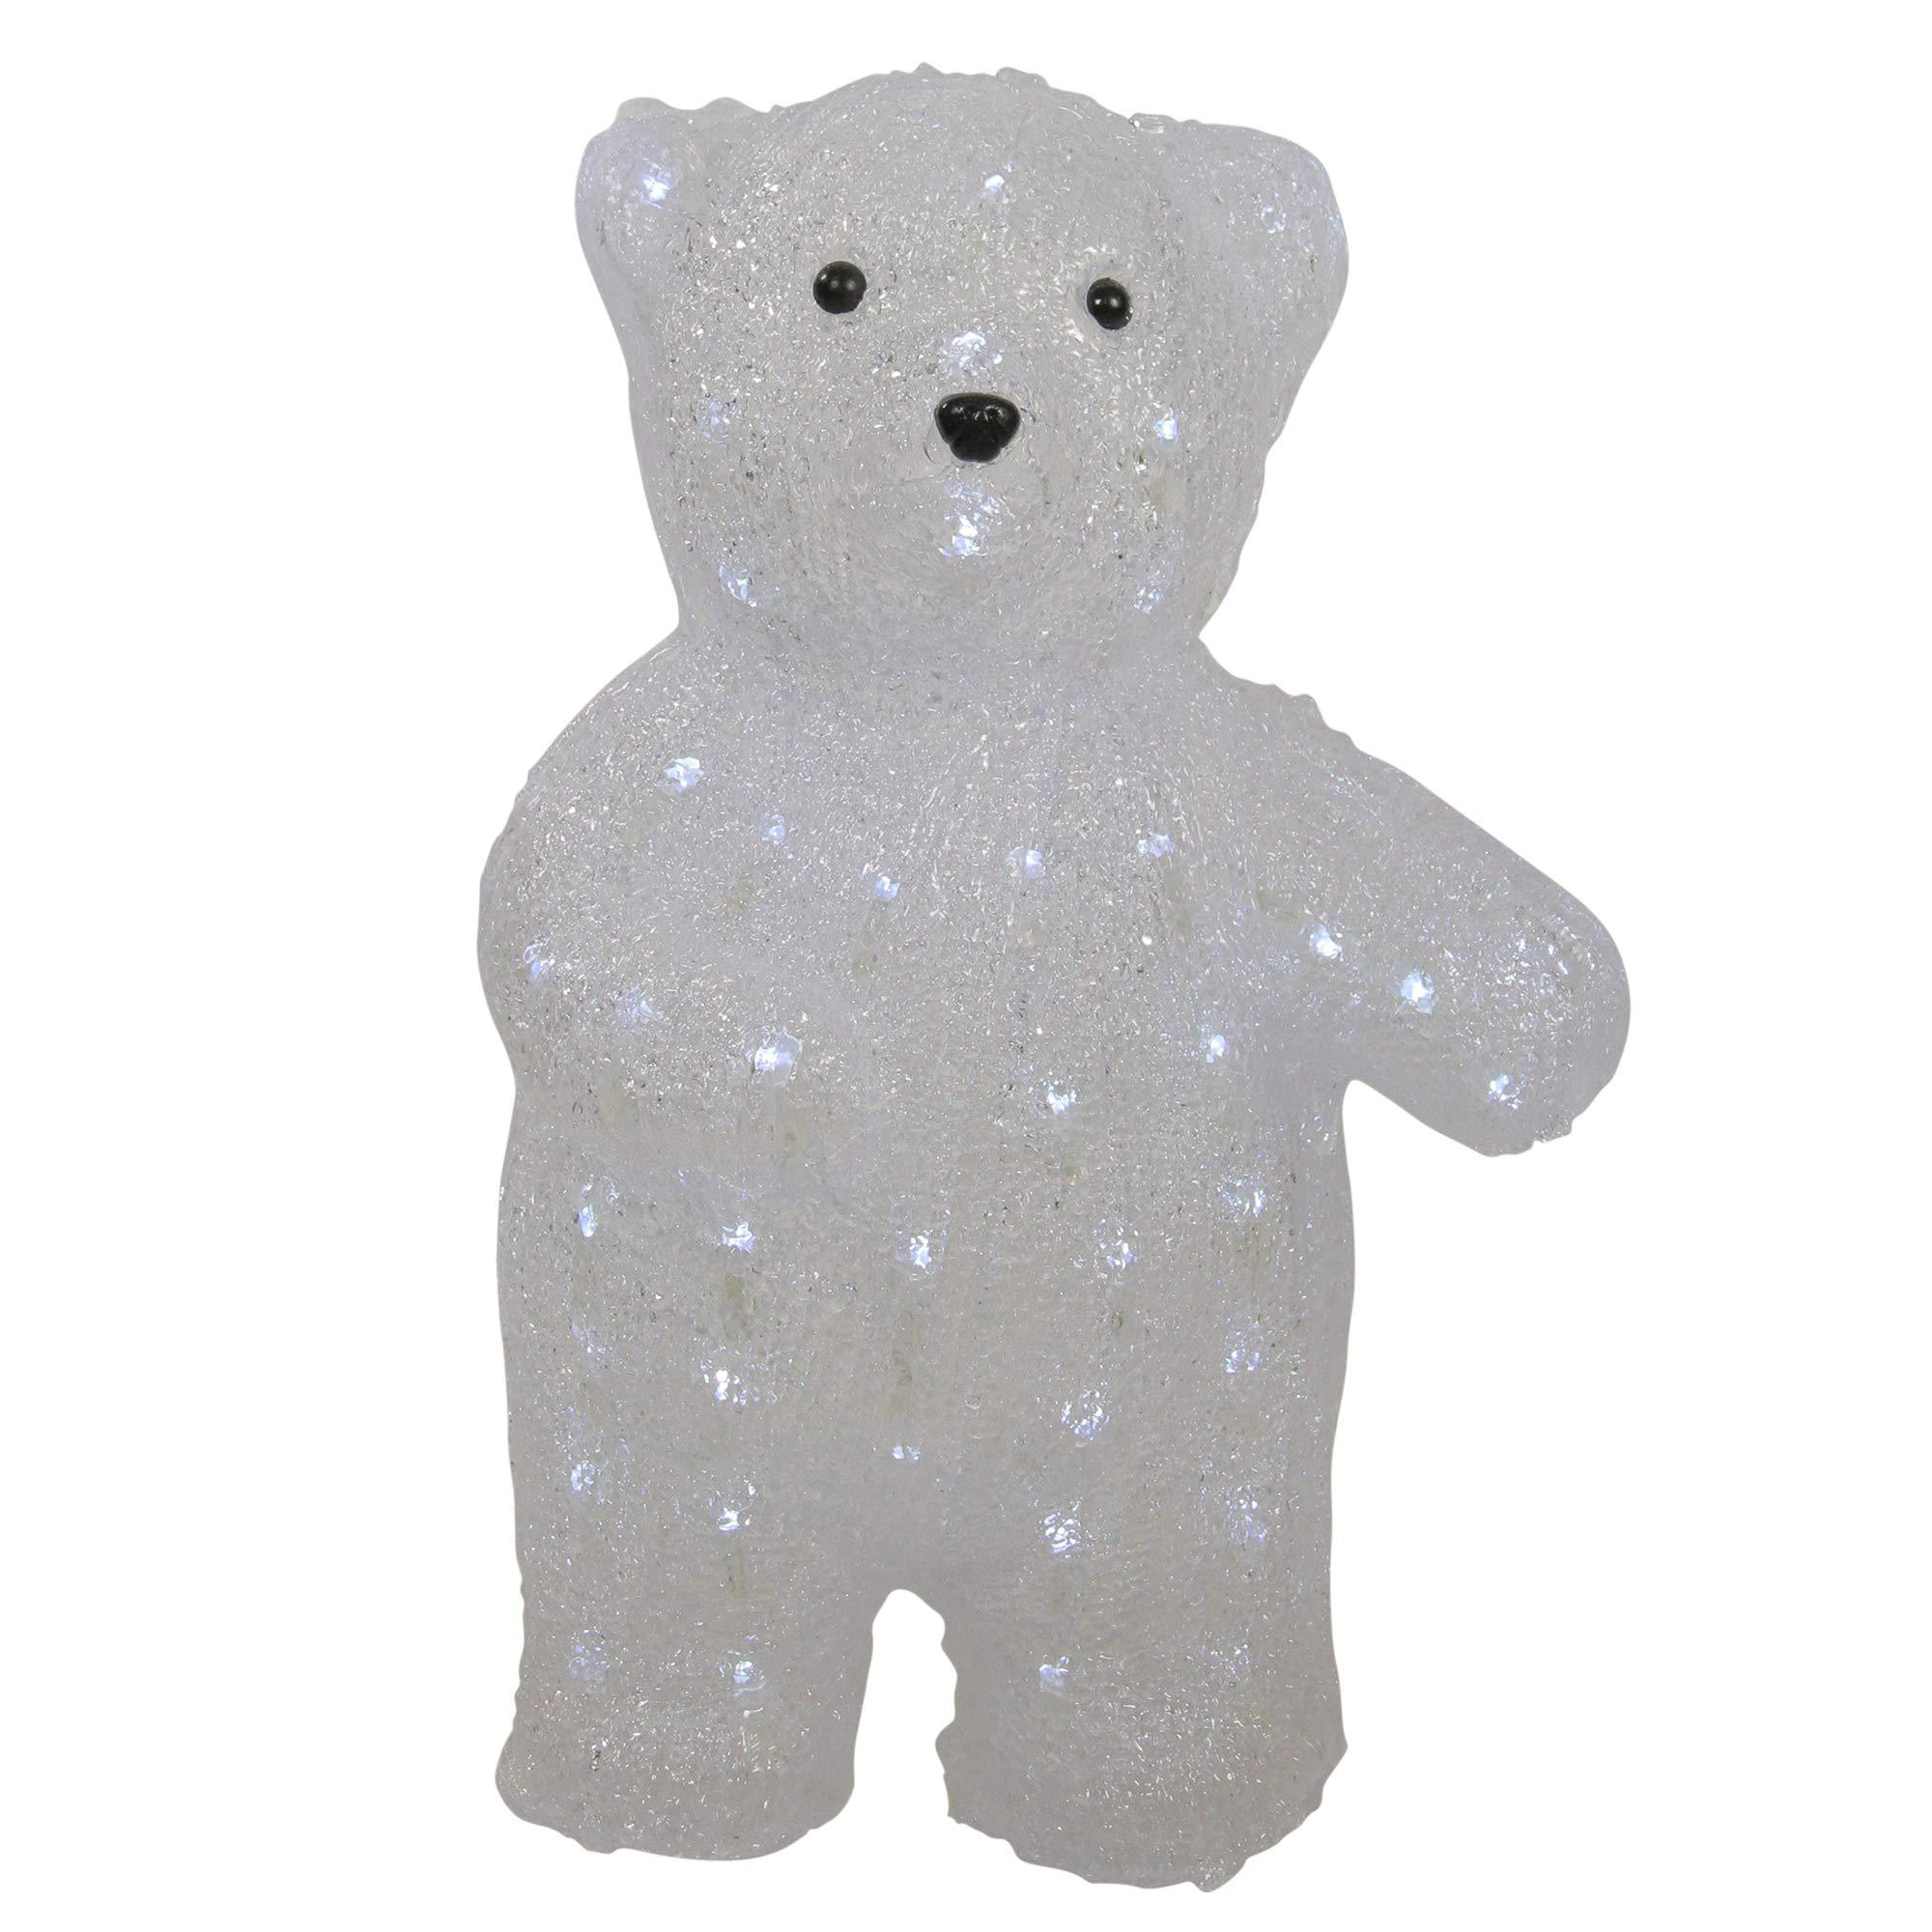 Northlight 17'' Pre-lit Acrylic Polar Bear Display Decoration - White LED Lights,